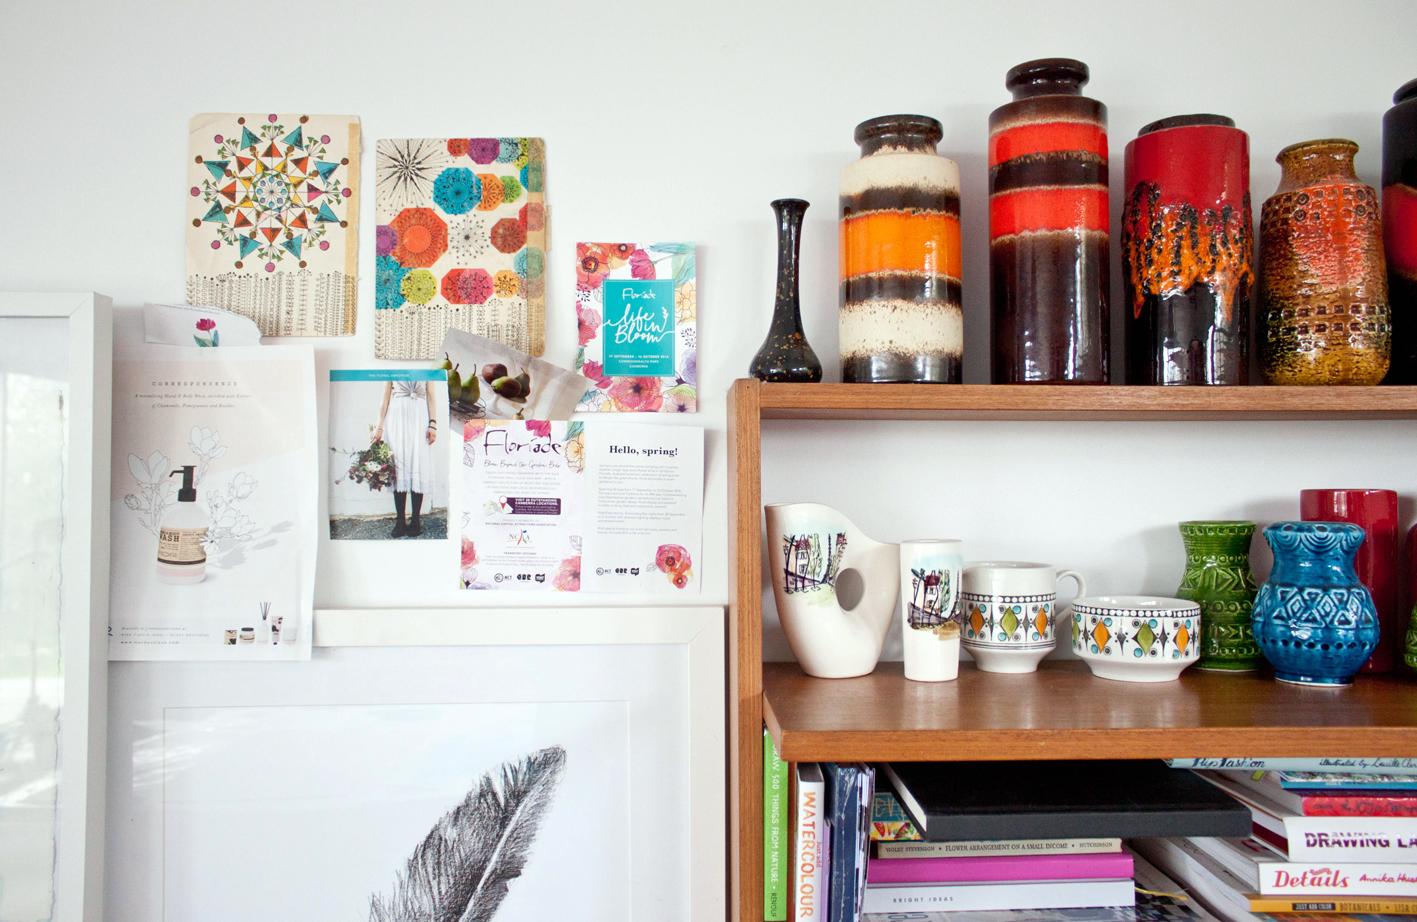 Australia artist studio visit Shani Nottingham - The Corner Store Gallery